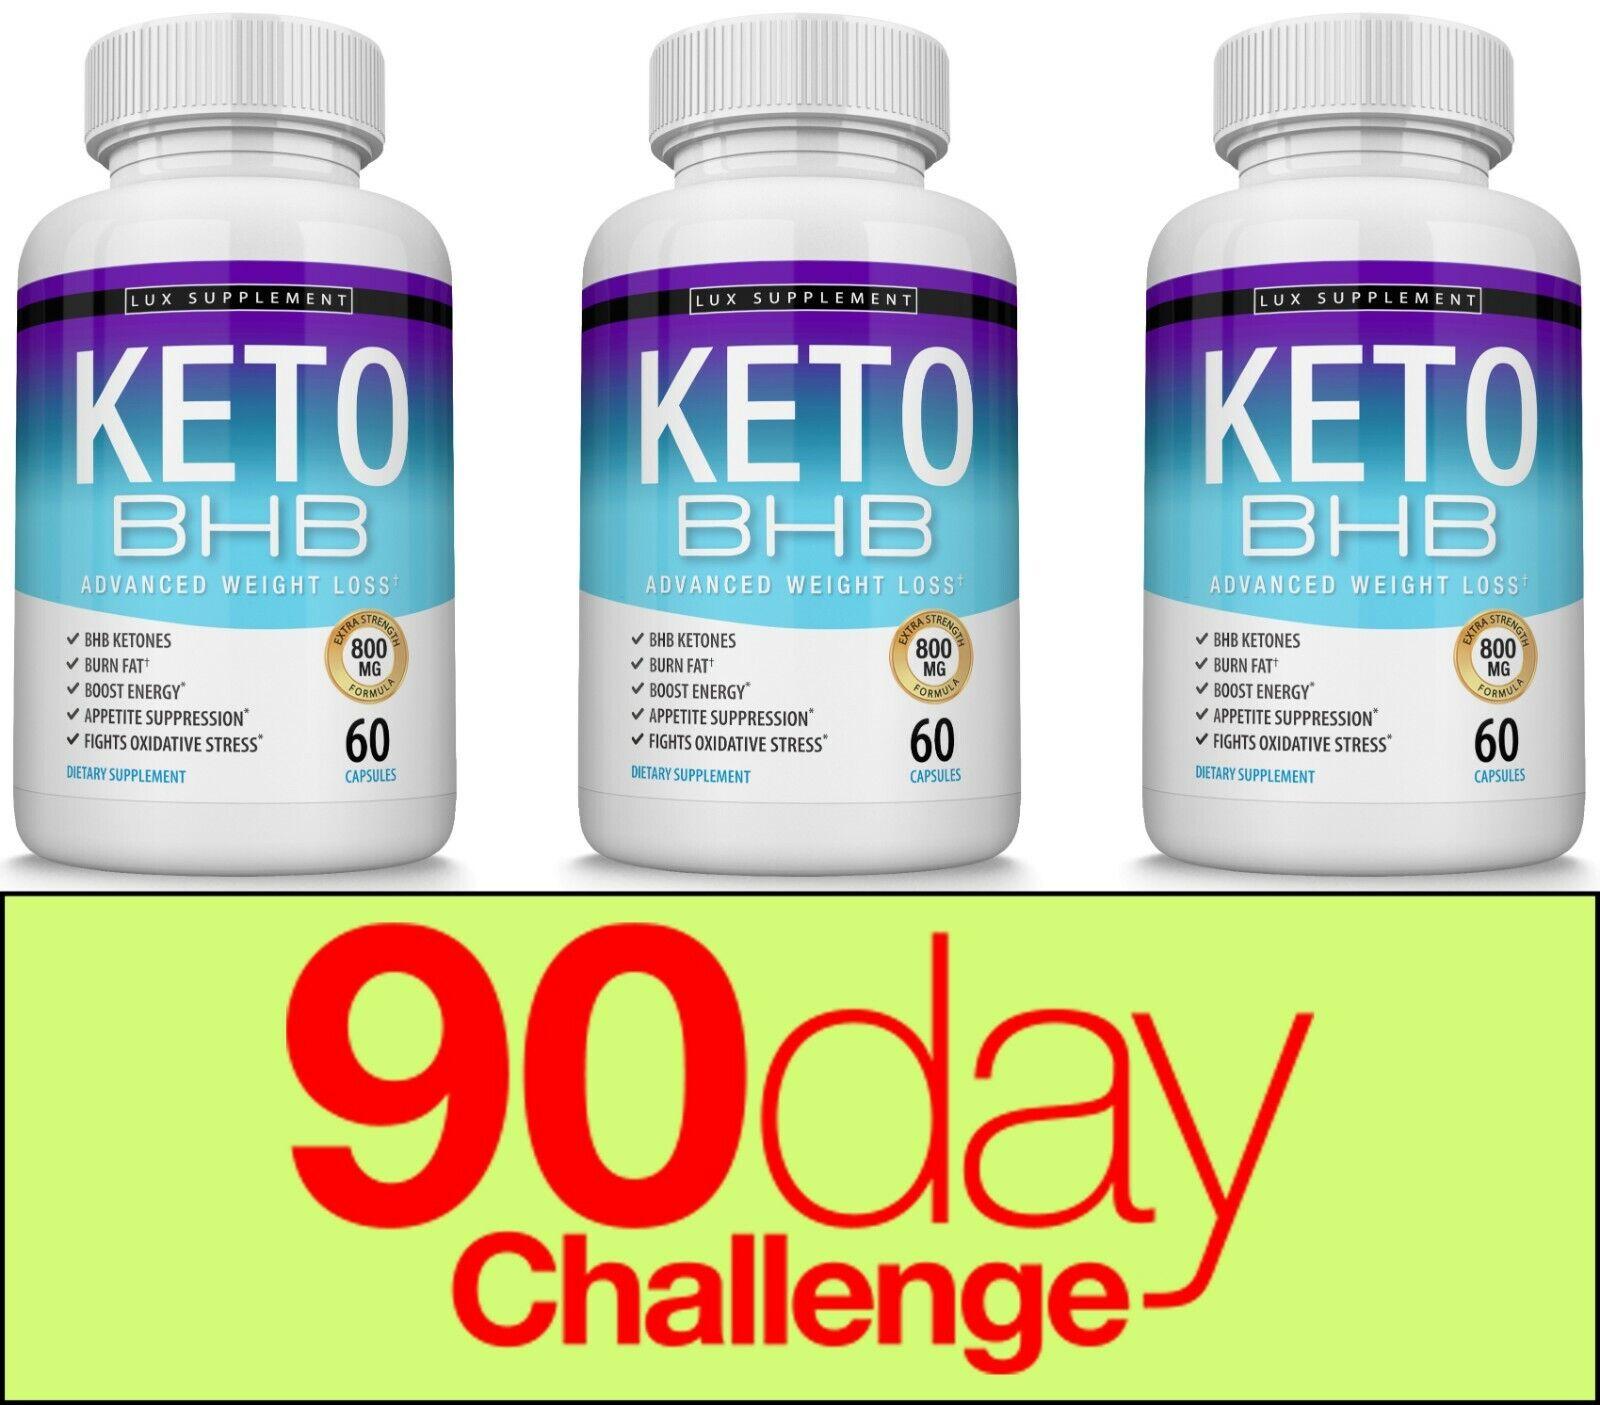 Keto Diet Pills BHB Advanced Ketosis Weight Loss To Burn Fat Fast 3 Month Supply s l1600